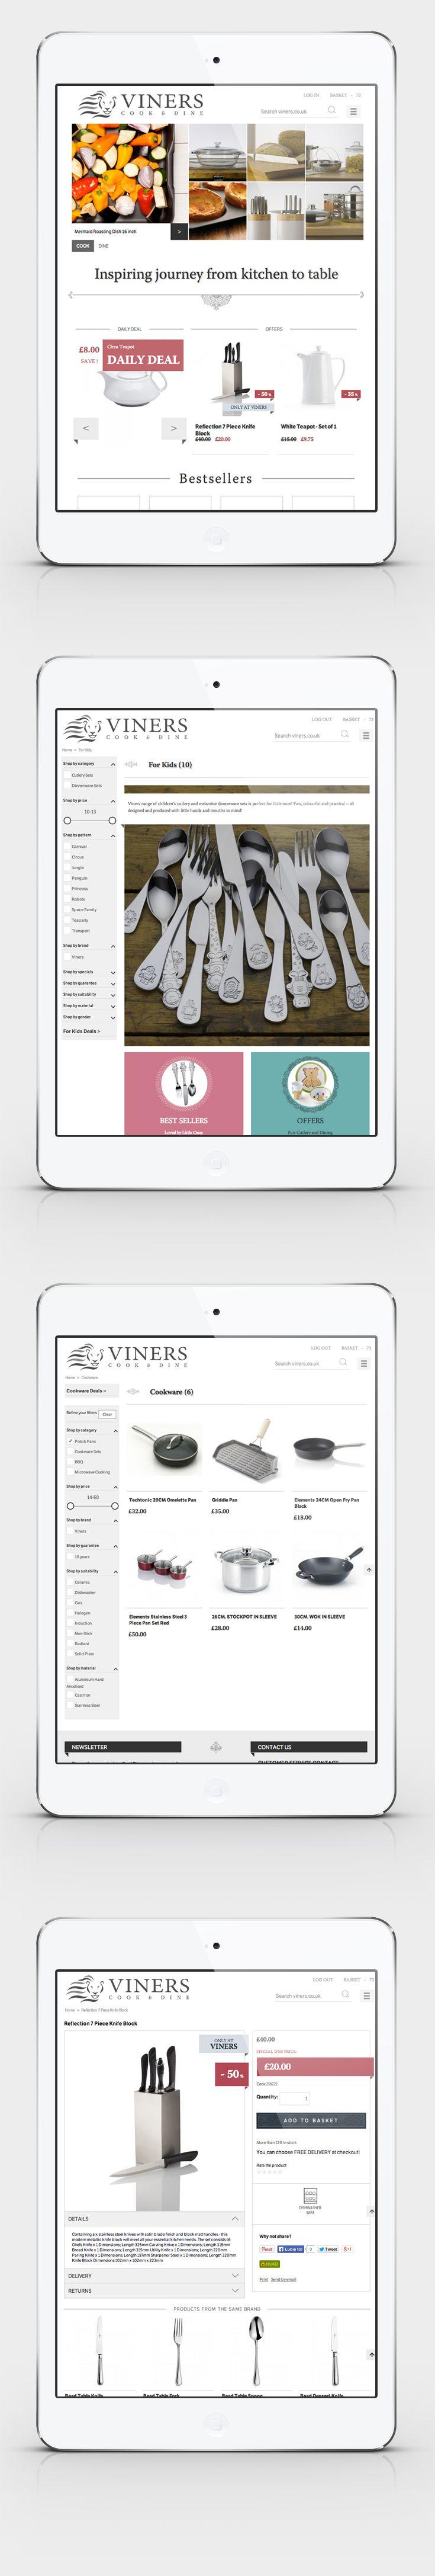 Viners Oneida Ltd / the Product Path – impressive heritage of Oneida Ltd. brands – responsive e-commerce website www.viners.co.uk/